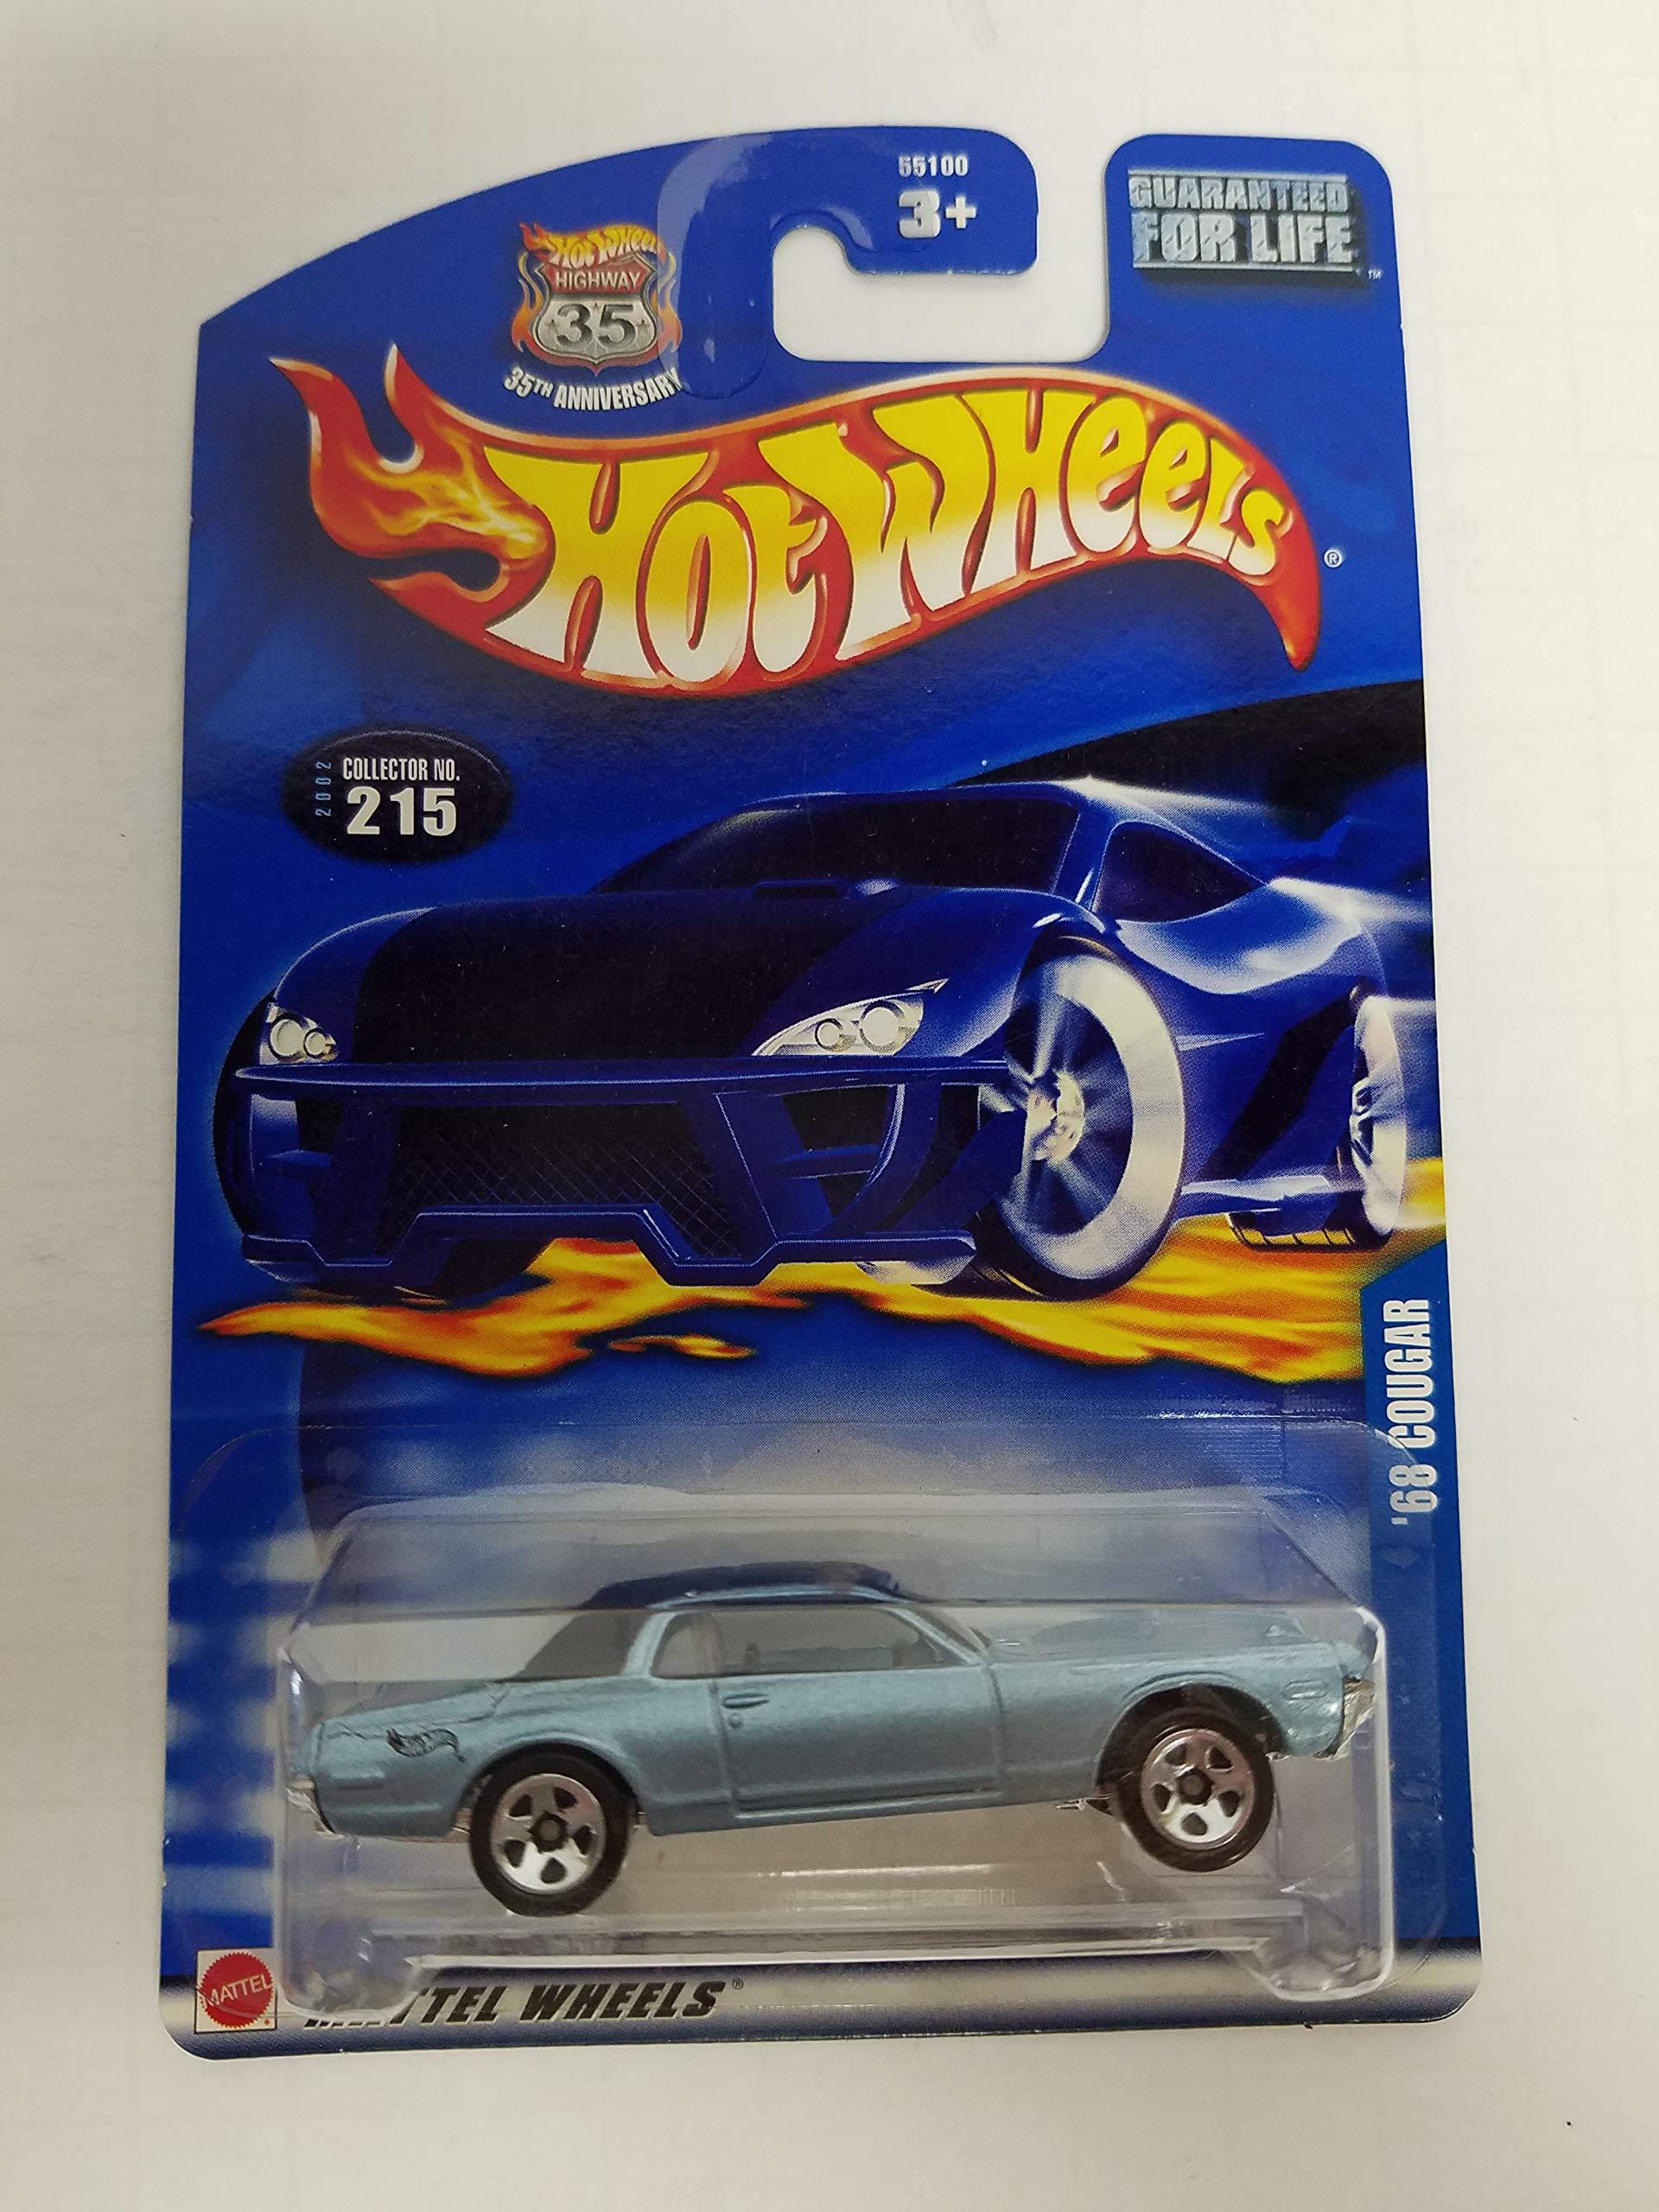 '68 Cougar Hot Wheels 2002 diecast 1/64 scale car No. 215